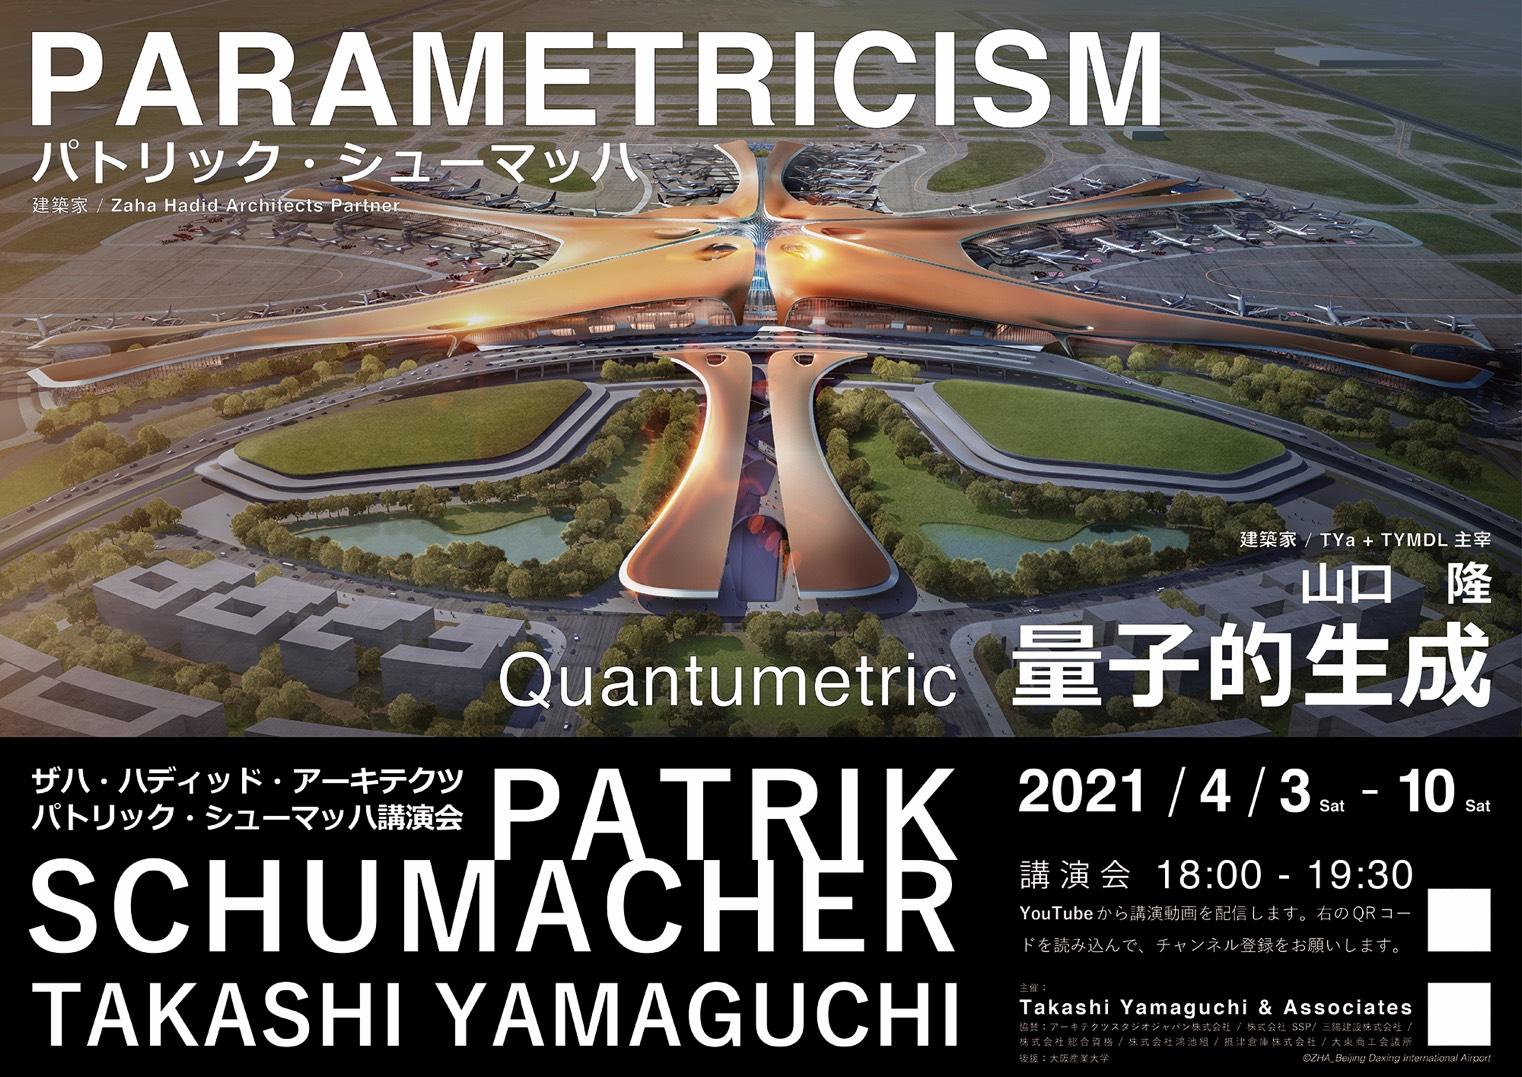 PARAMETRICISM / 量子的生成 Quantumetric